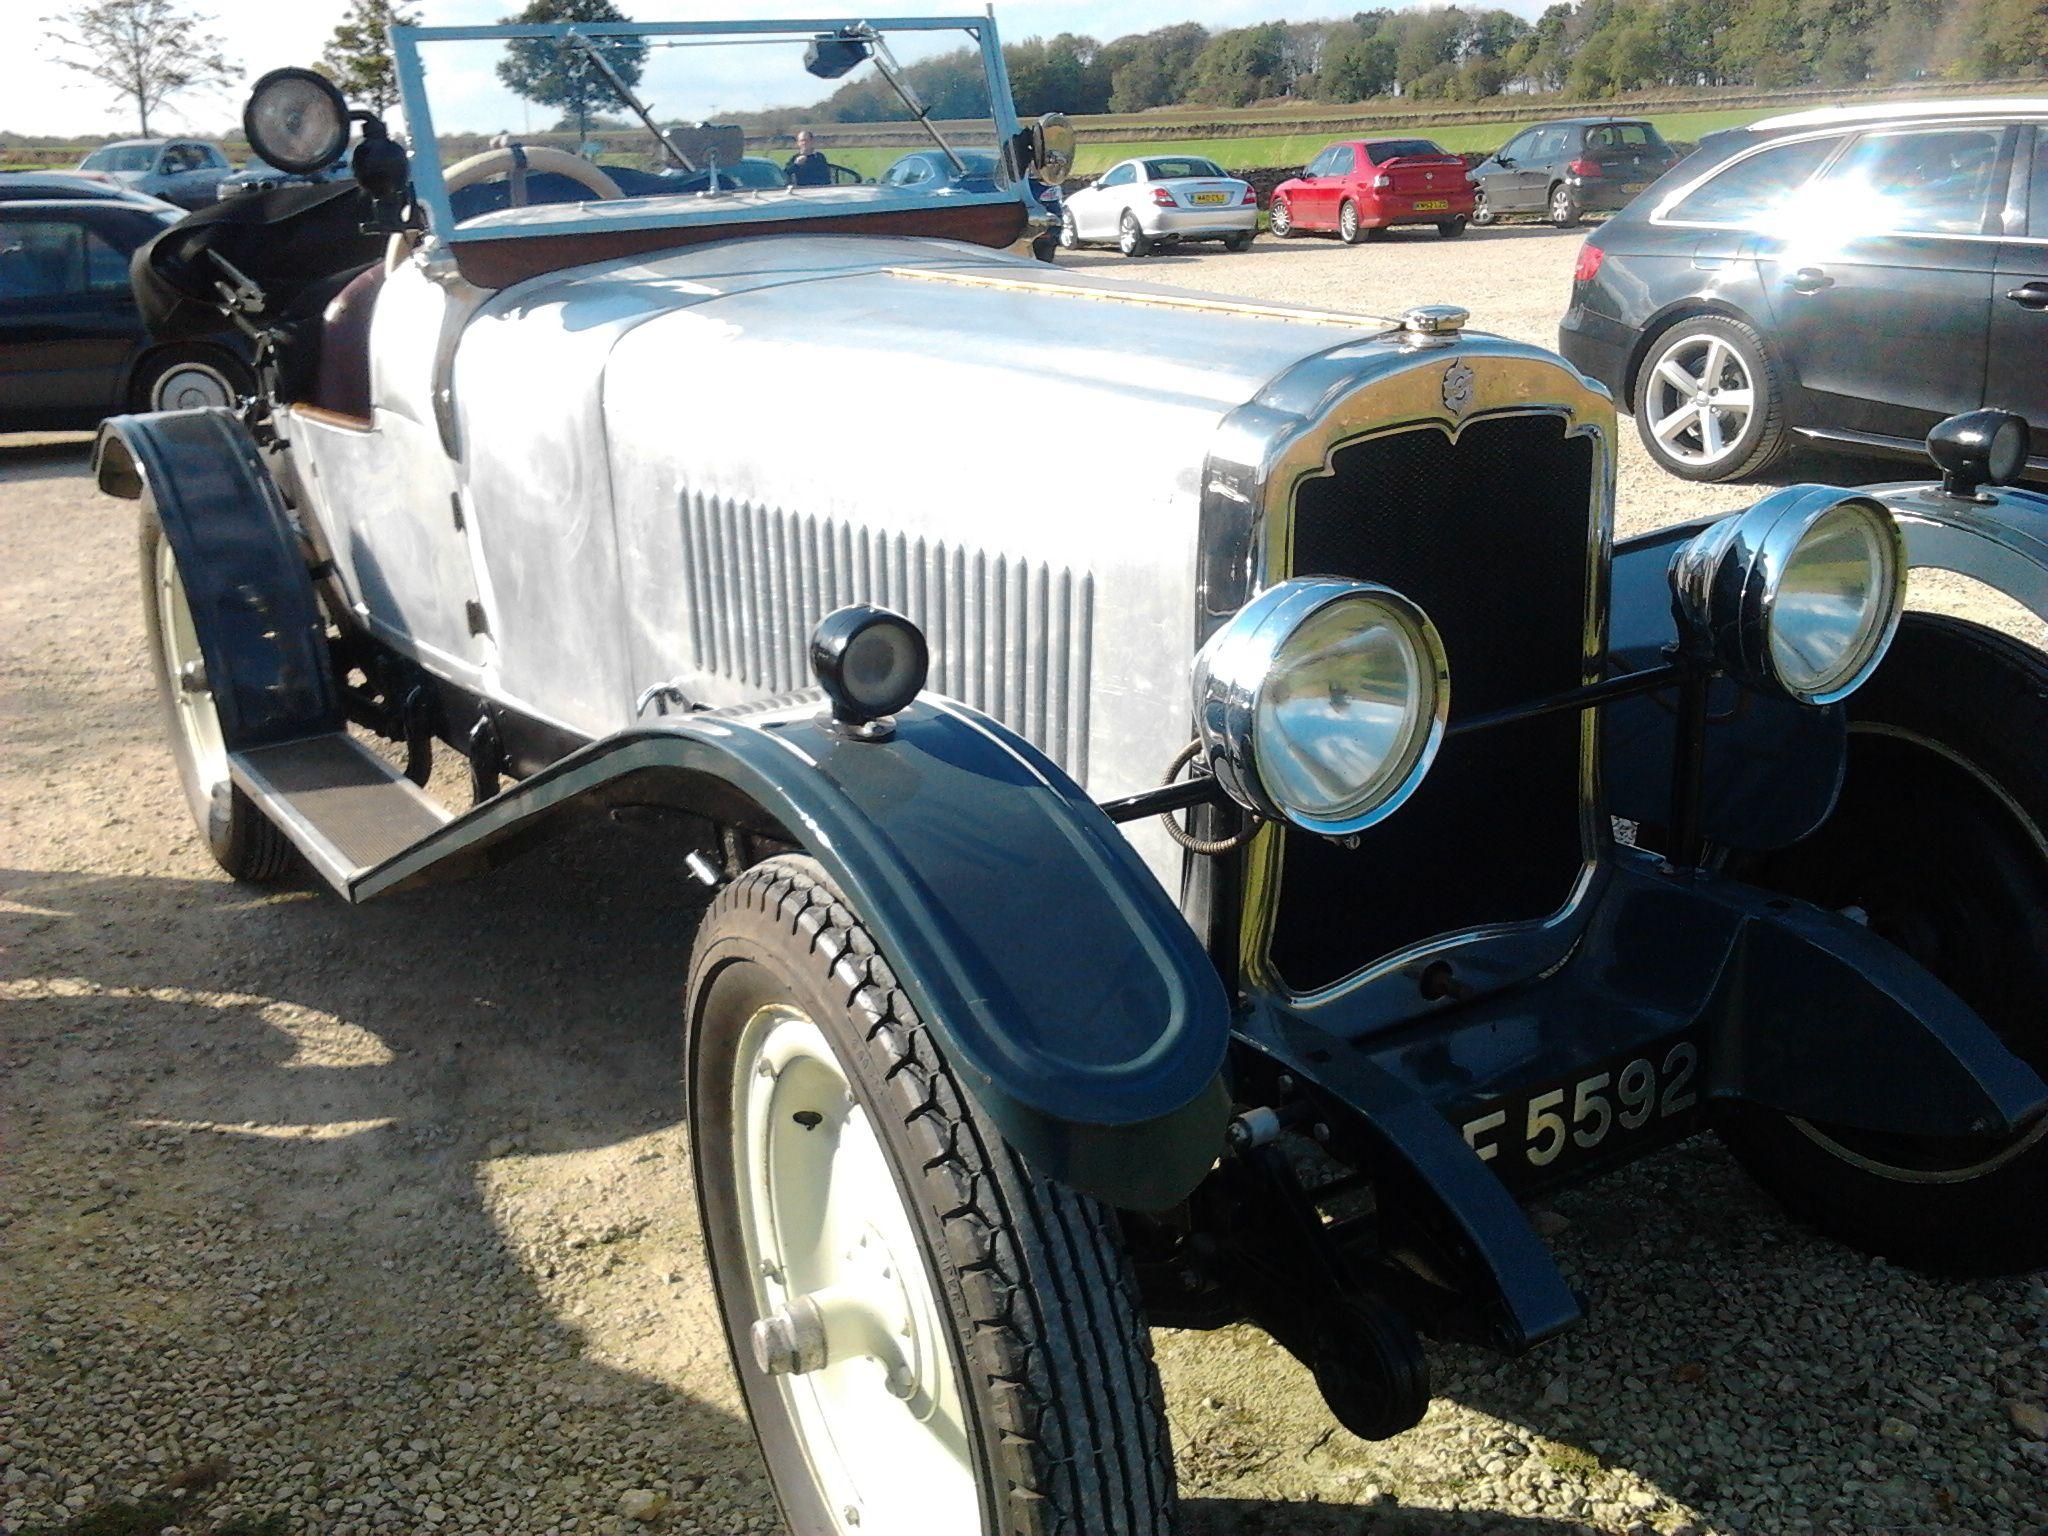 Cars at Lapstones one Saturday morning